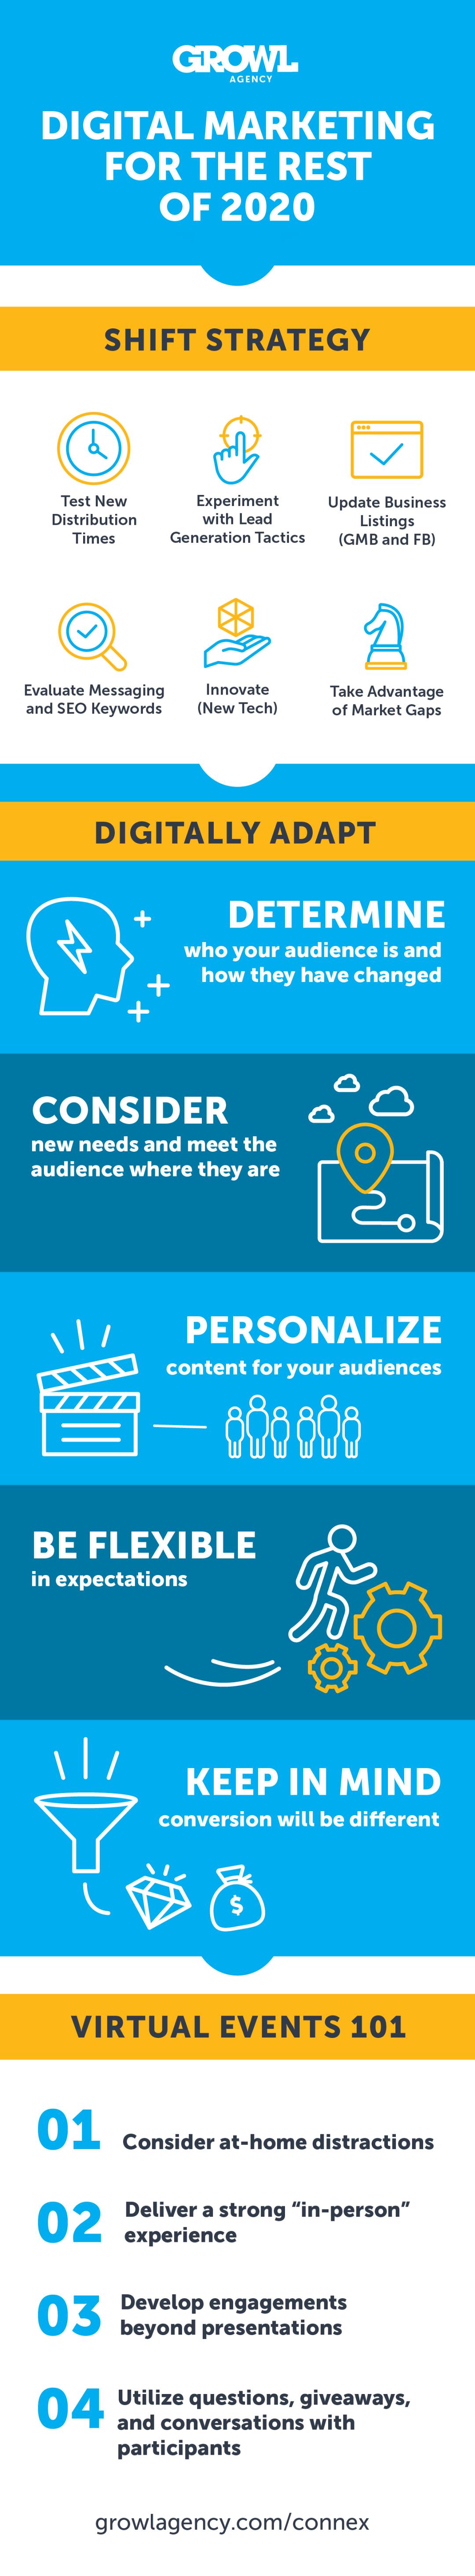 https://growlagency.com/digital-marketing-for-the-rest-of-2020/